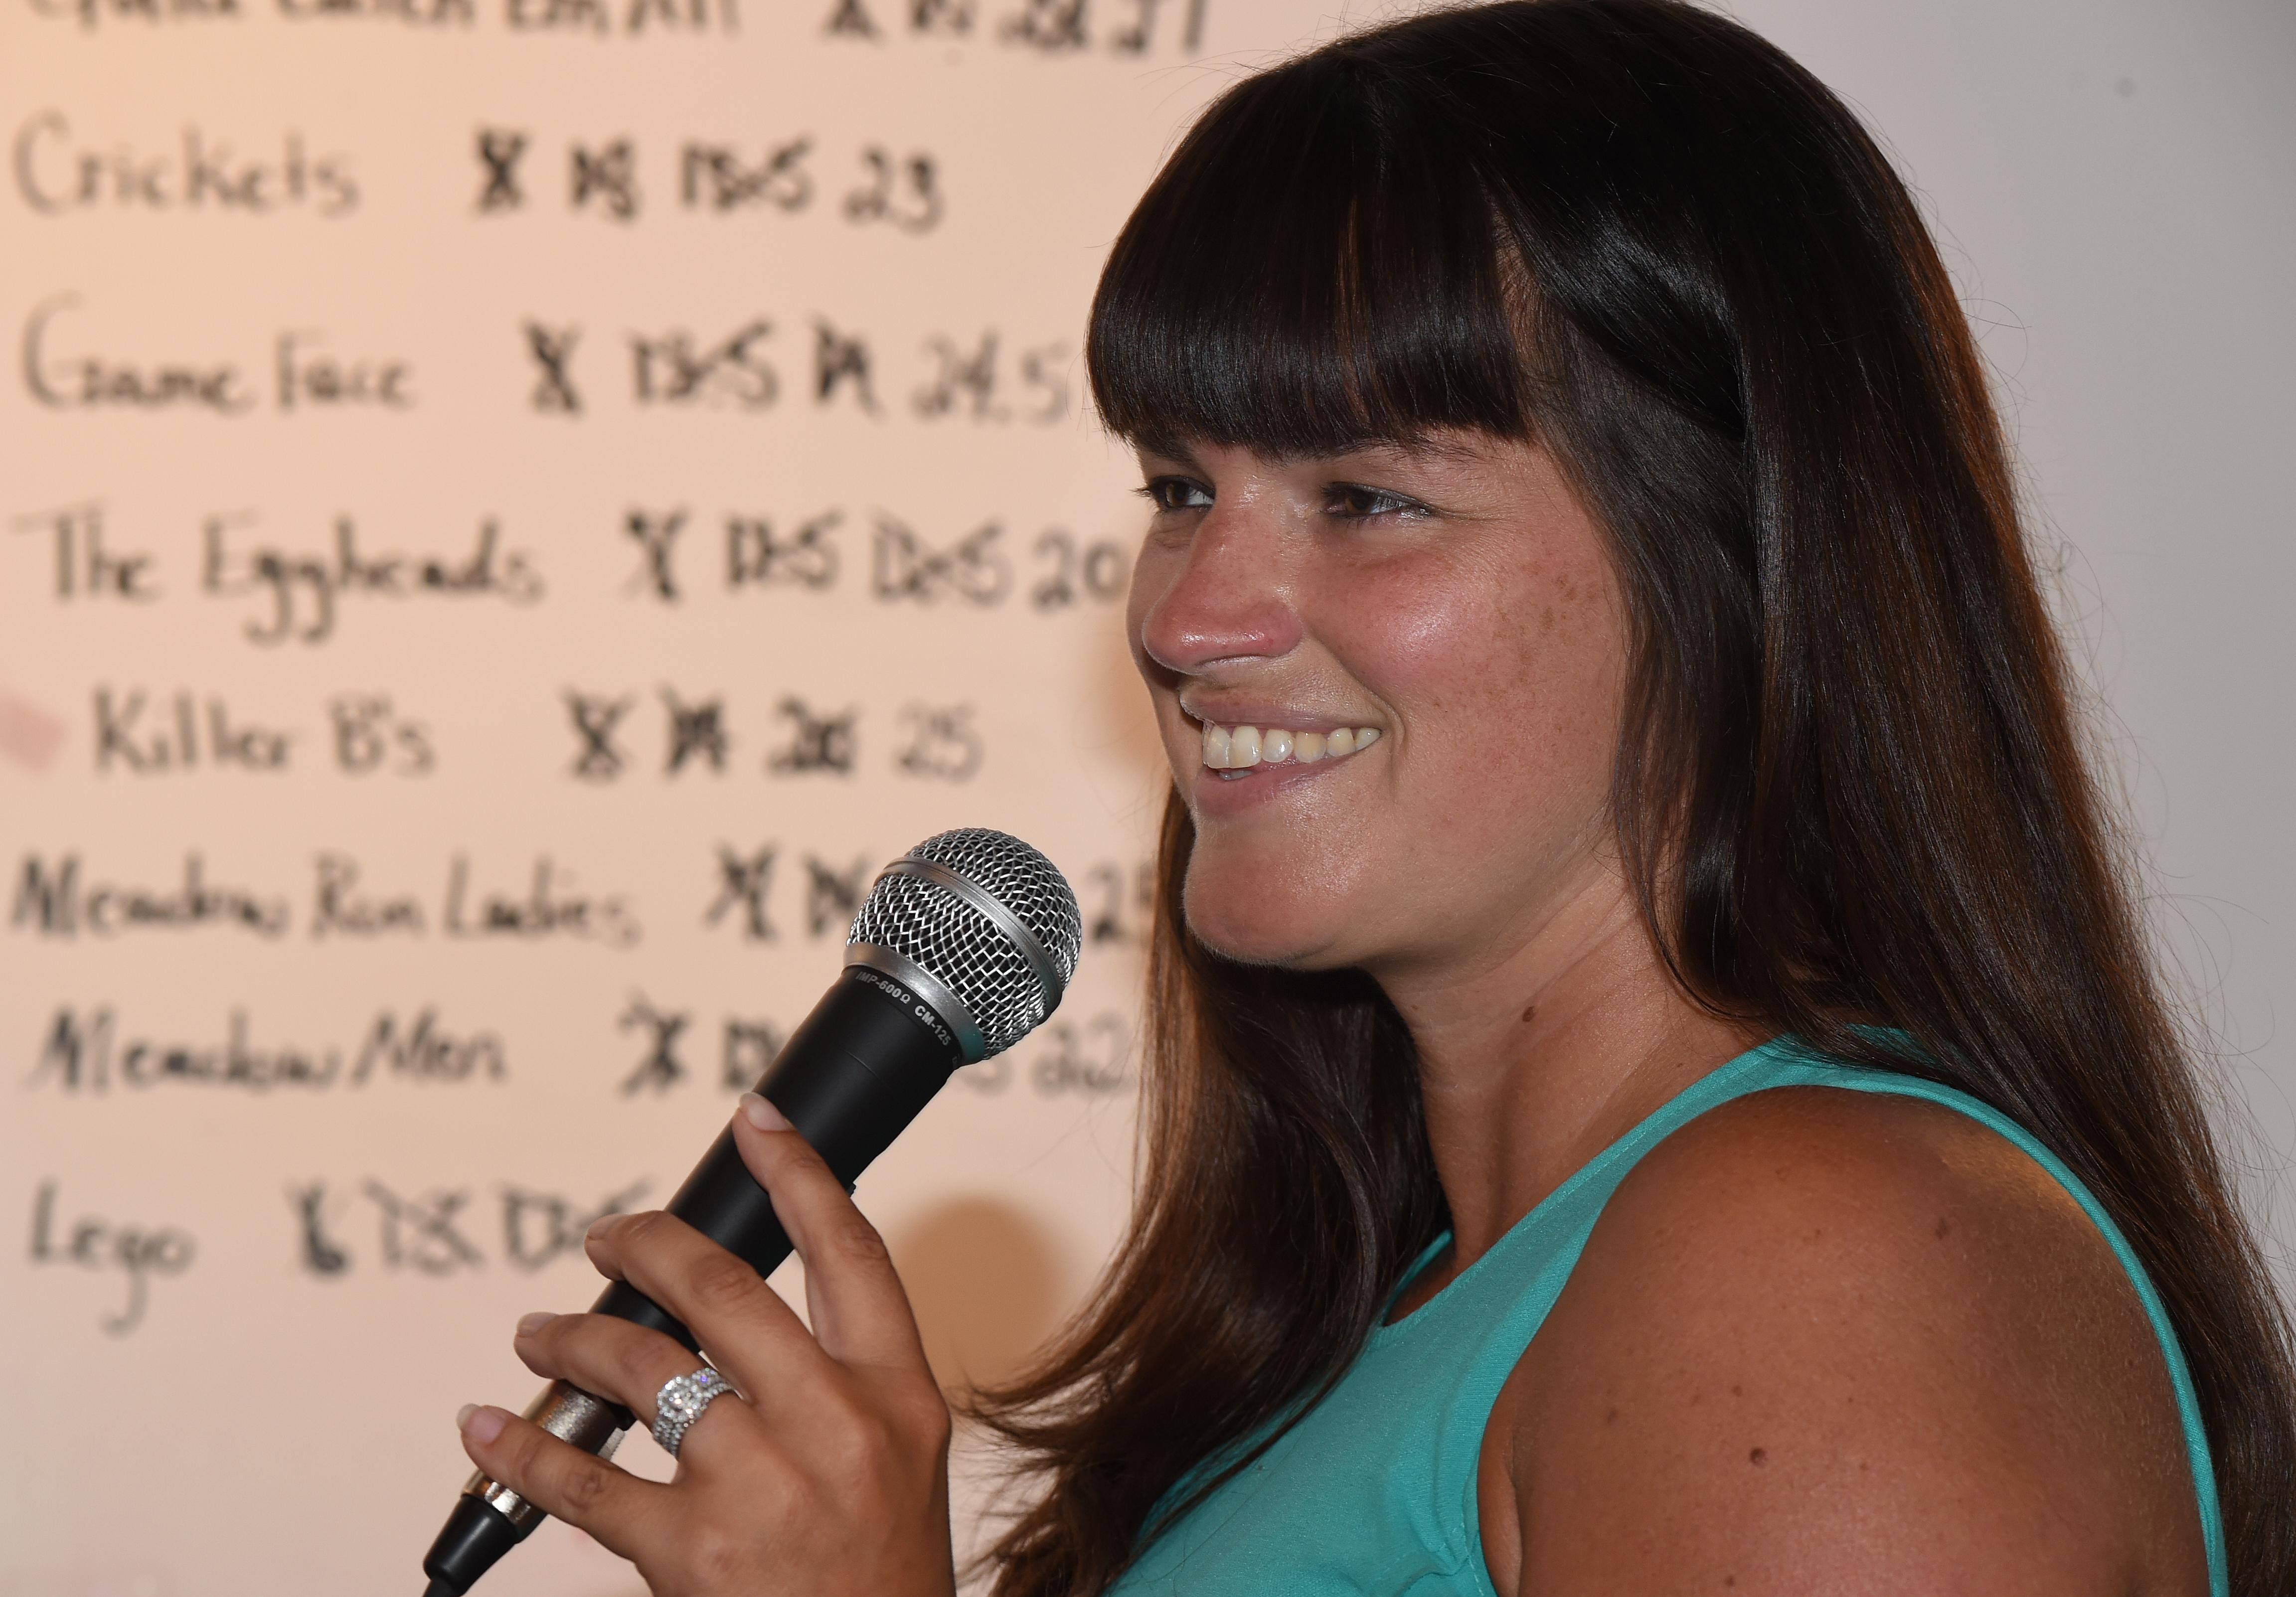 08-06-18 Trivia, Kristen Lisiecki 1